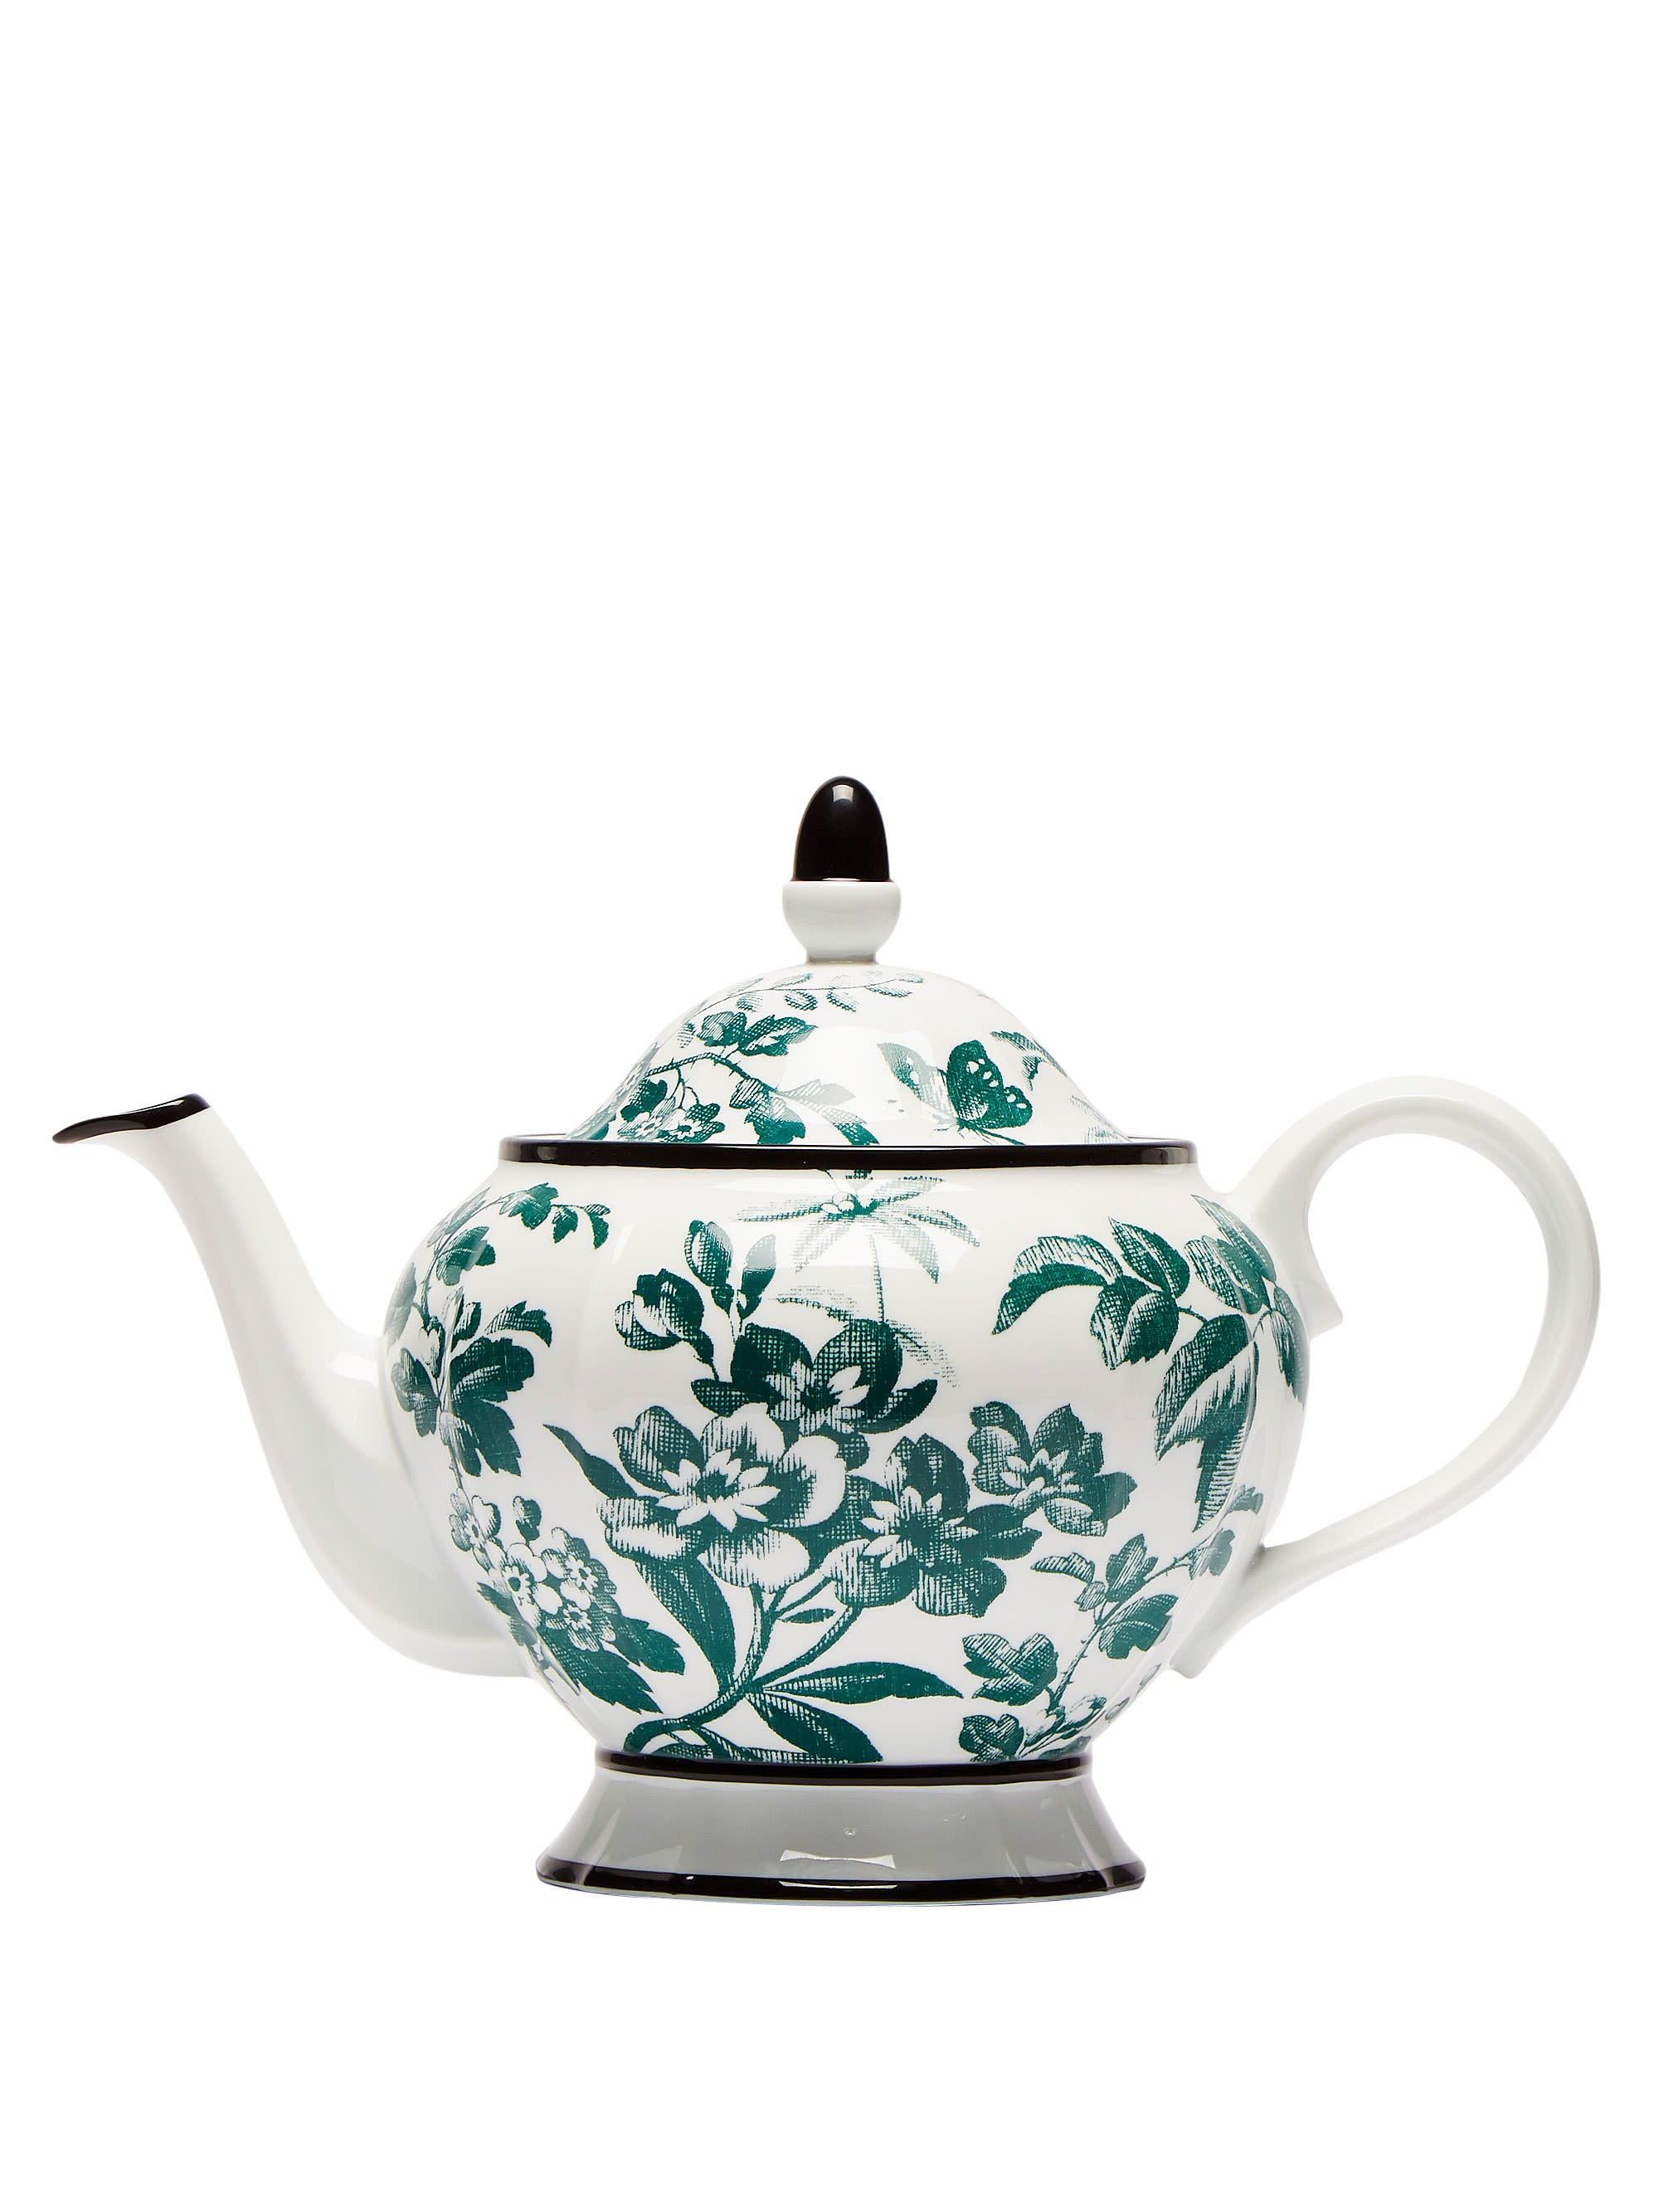 "<strong>Gucci</strong> Herbarium teapot; $590. <a href=""https://www.matchesfashion.com"" rel=""nofollow noopener"" target=""_blank"" data-ylk=""slk:matchesfashion.com"" class=""link rapid-noclick-resp""><em>matchesfashion.com</em></a>"